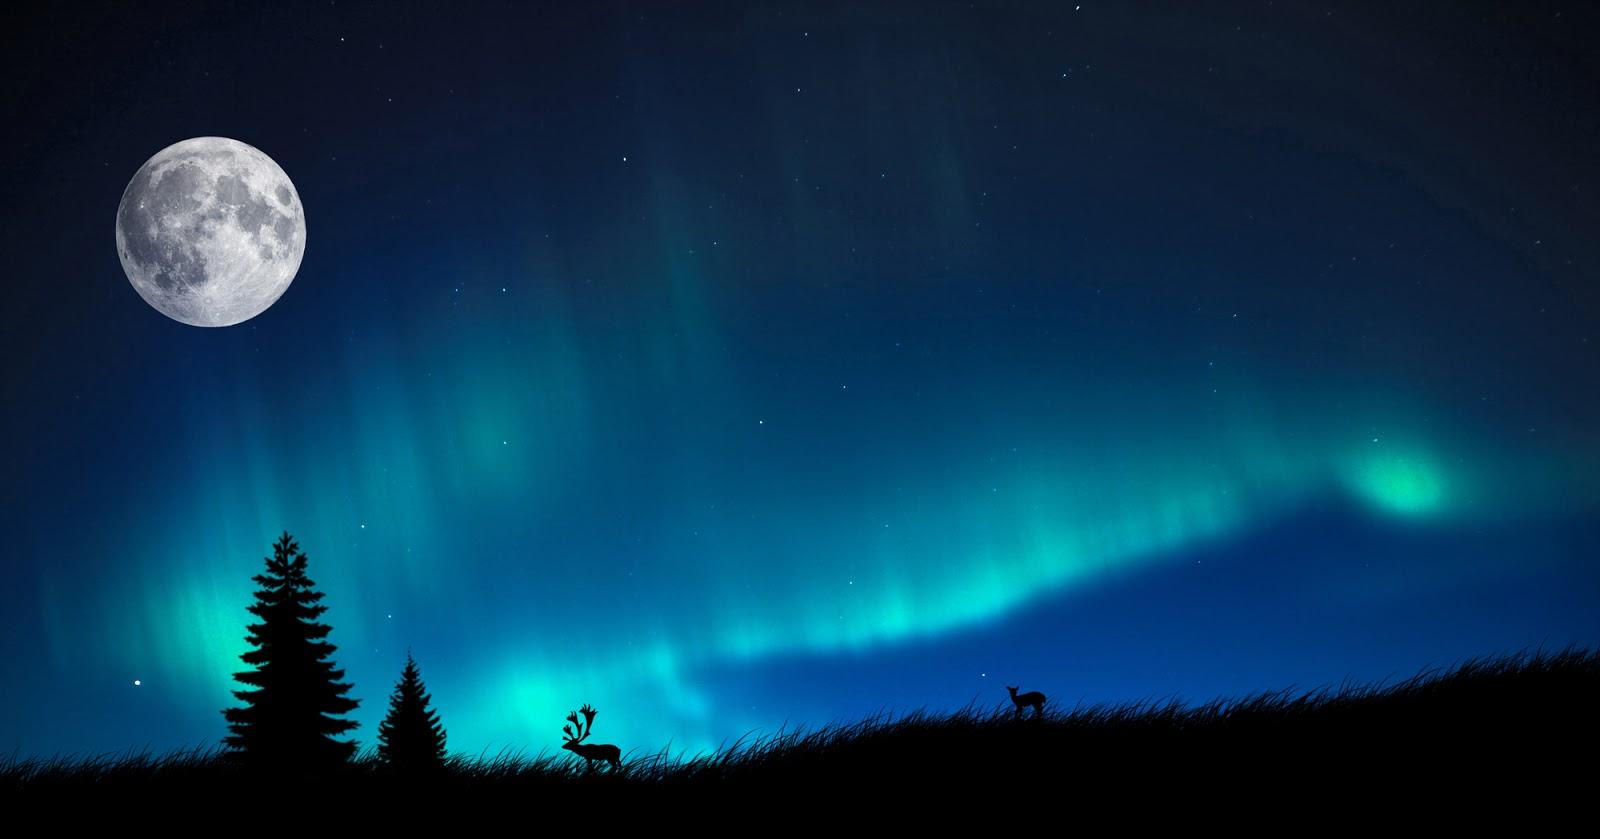 moon and aurora borealis wallpaper - beauty walpaper